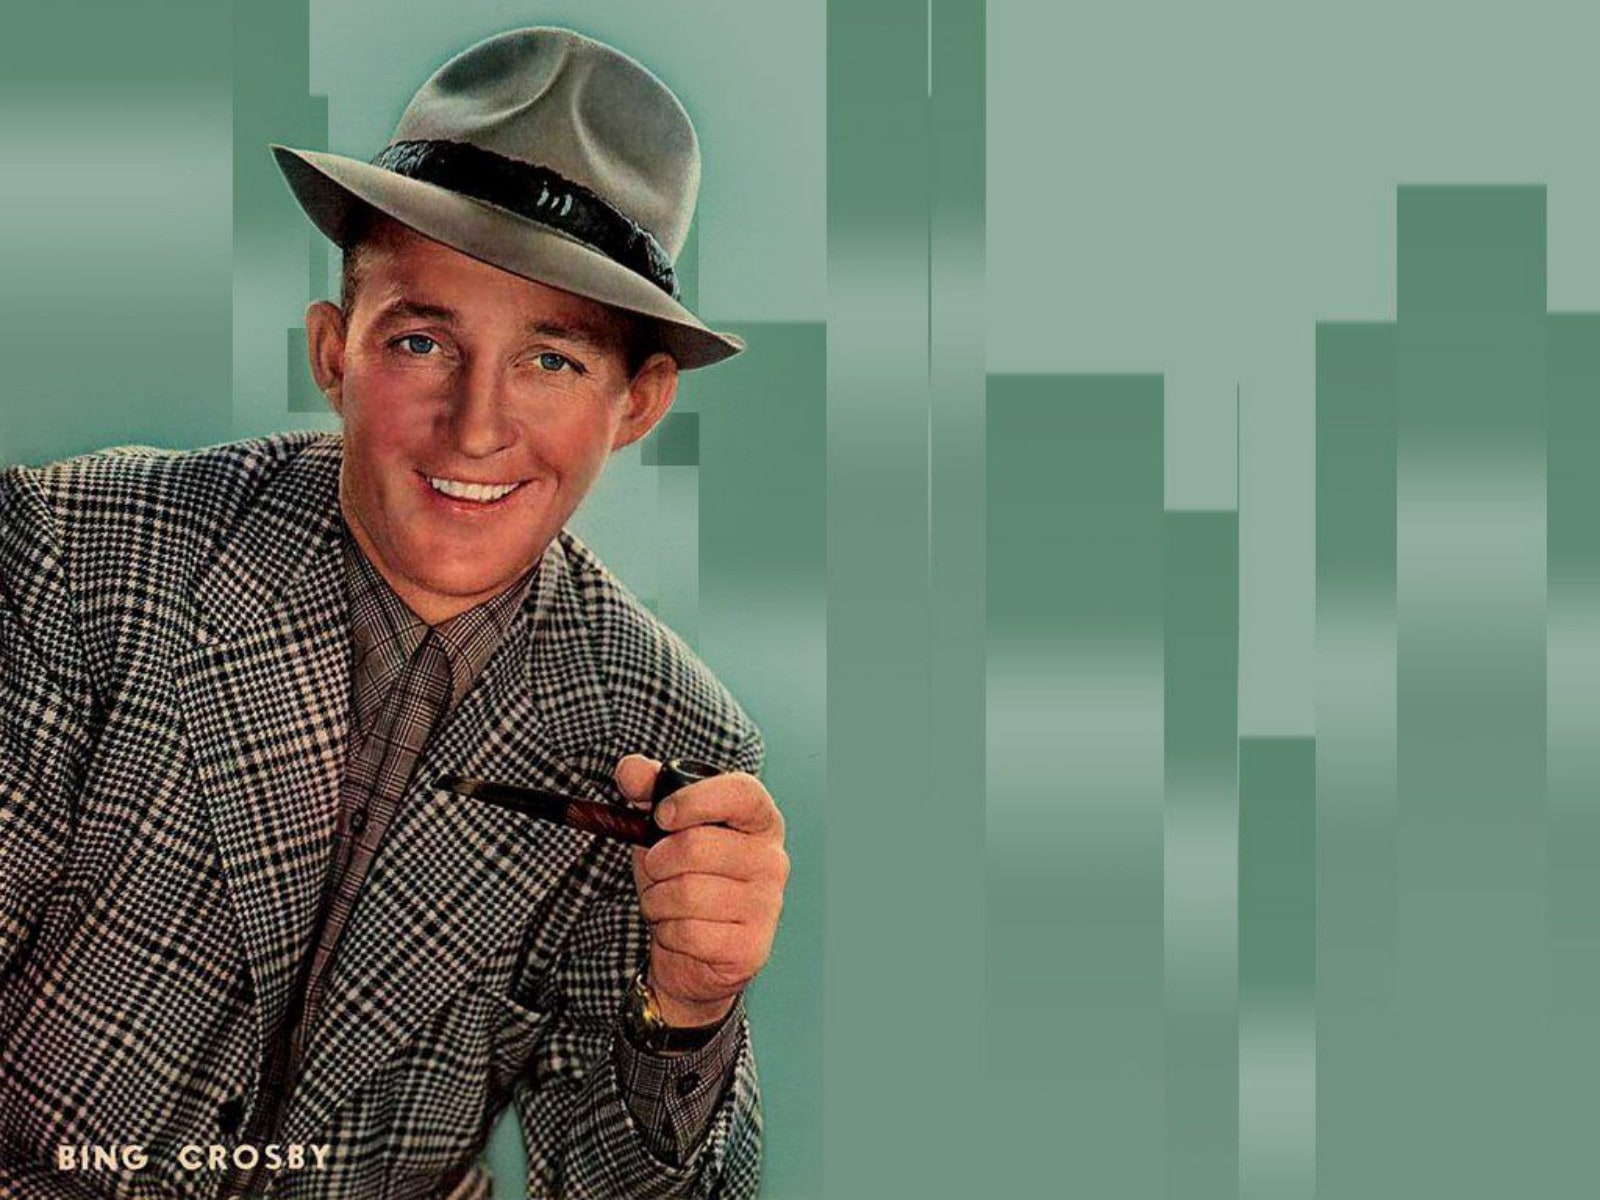 Bing Crosby Wallpaper